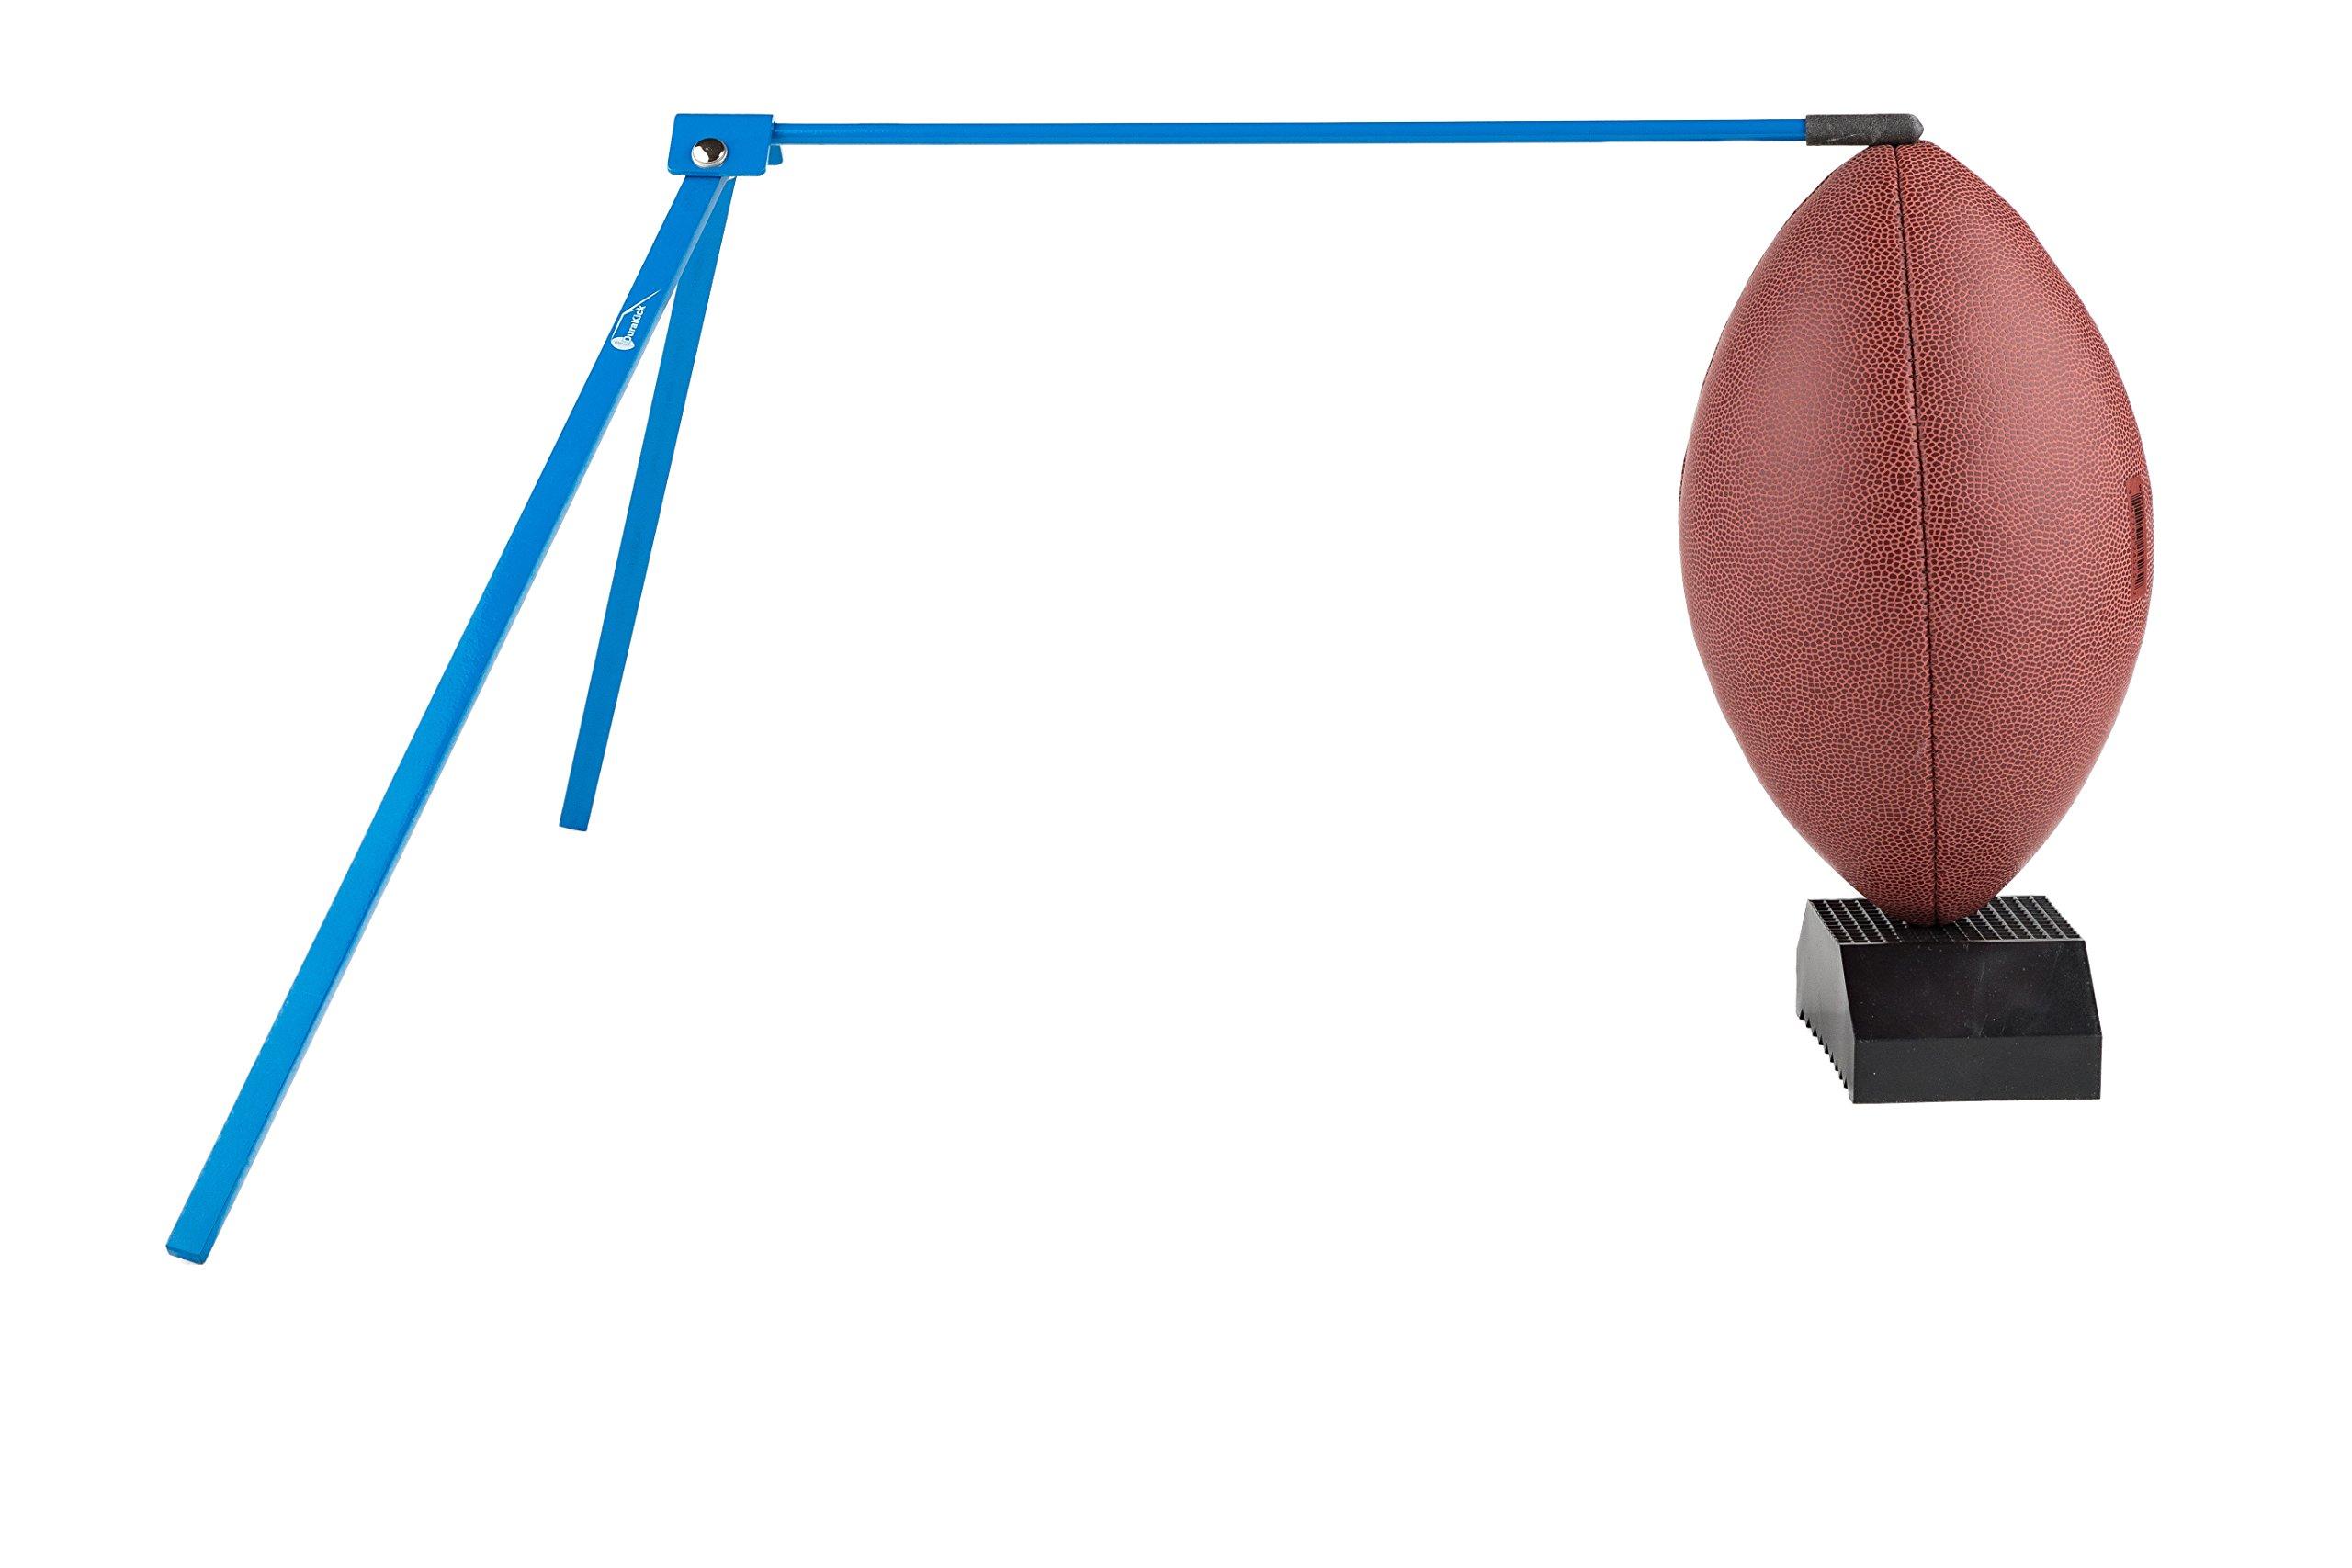 DuraKick Football Kicking Holder (Includes 2 inch block)